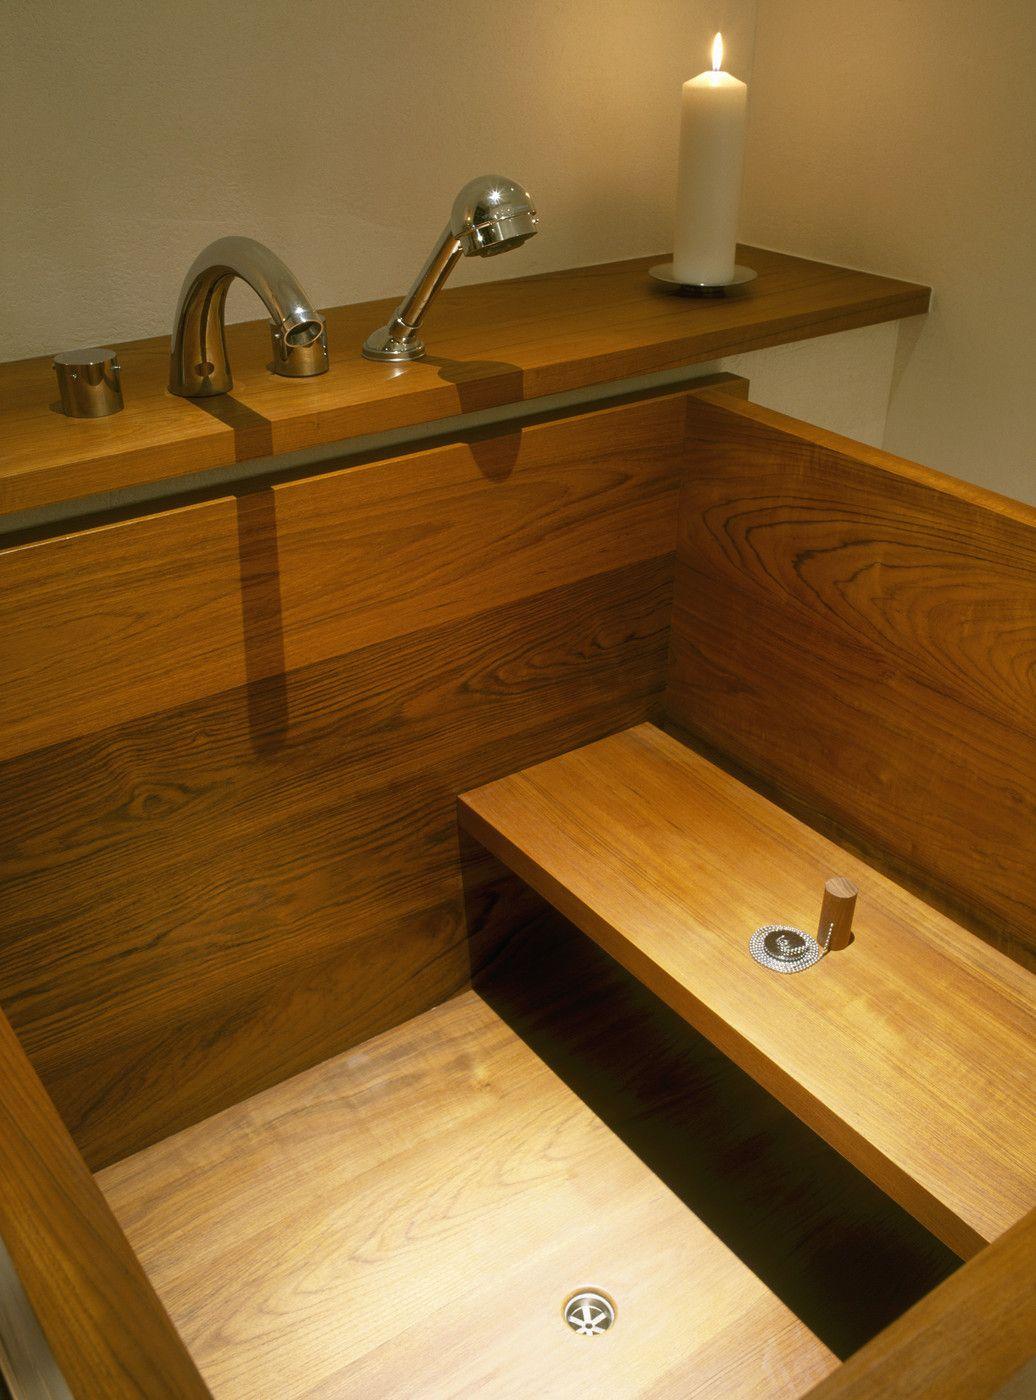 Bathroom photos interesting wood teak take on a